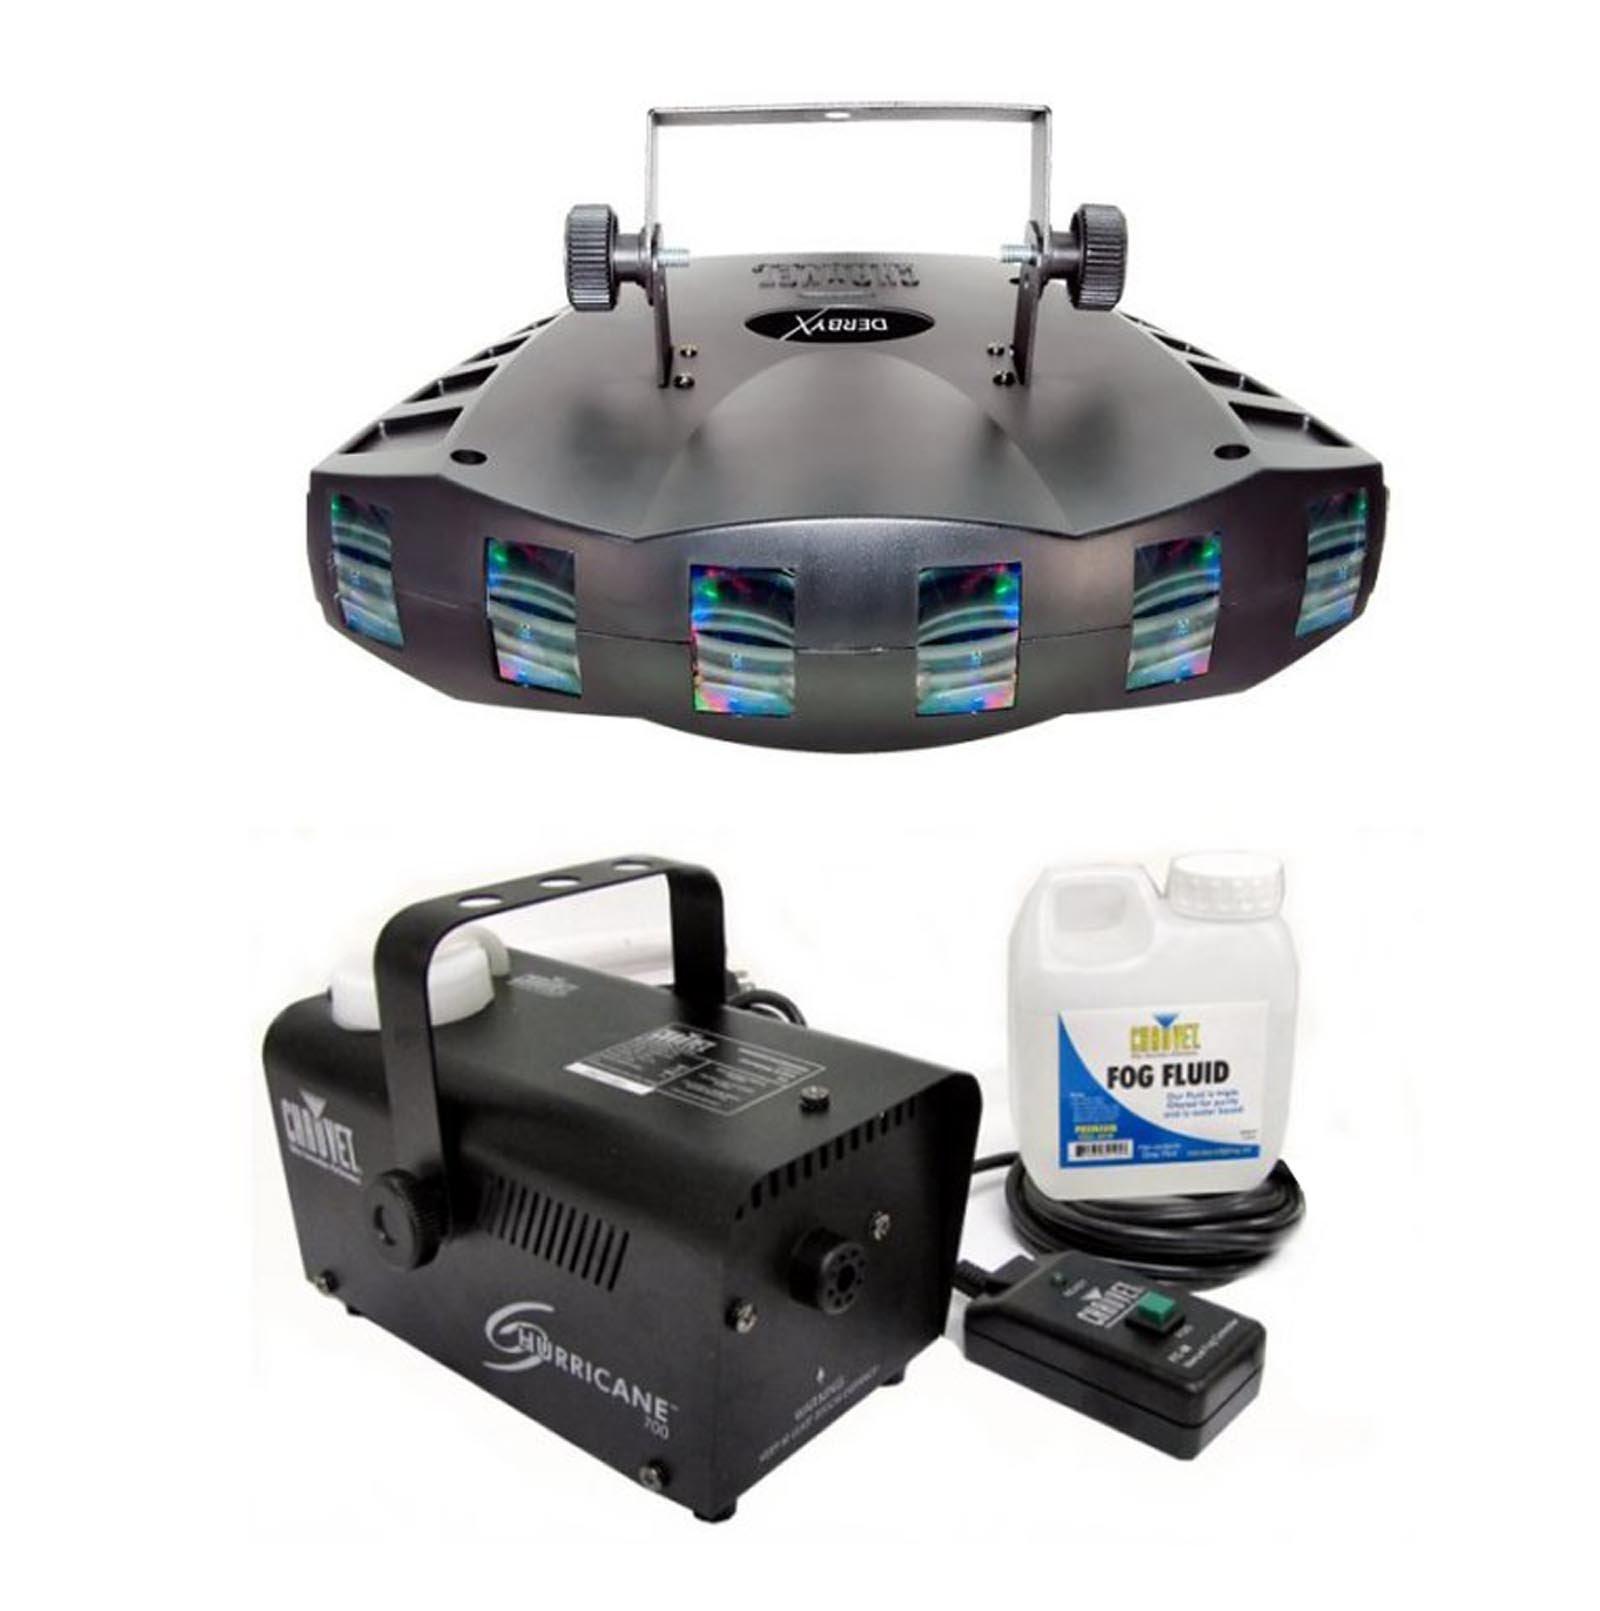 CHAUVET DERBY X RGB DMX Pro DJ Club Effect Strobe Light + H700 Fog/Smoke Machine by CHAUVET DJ